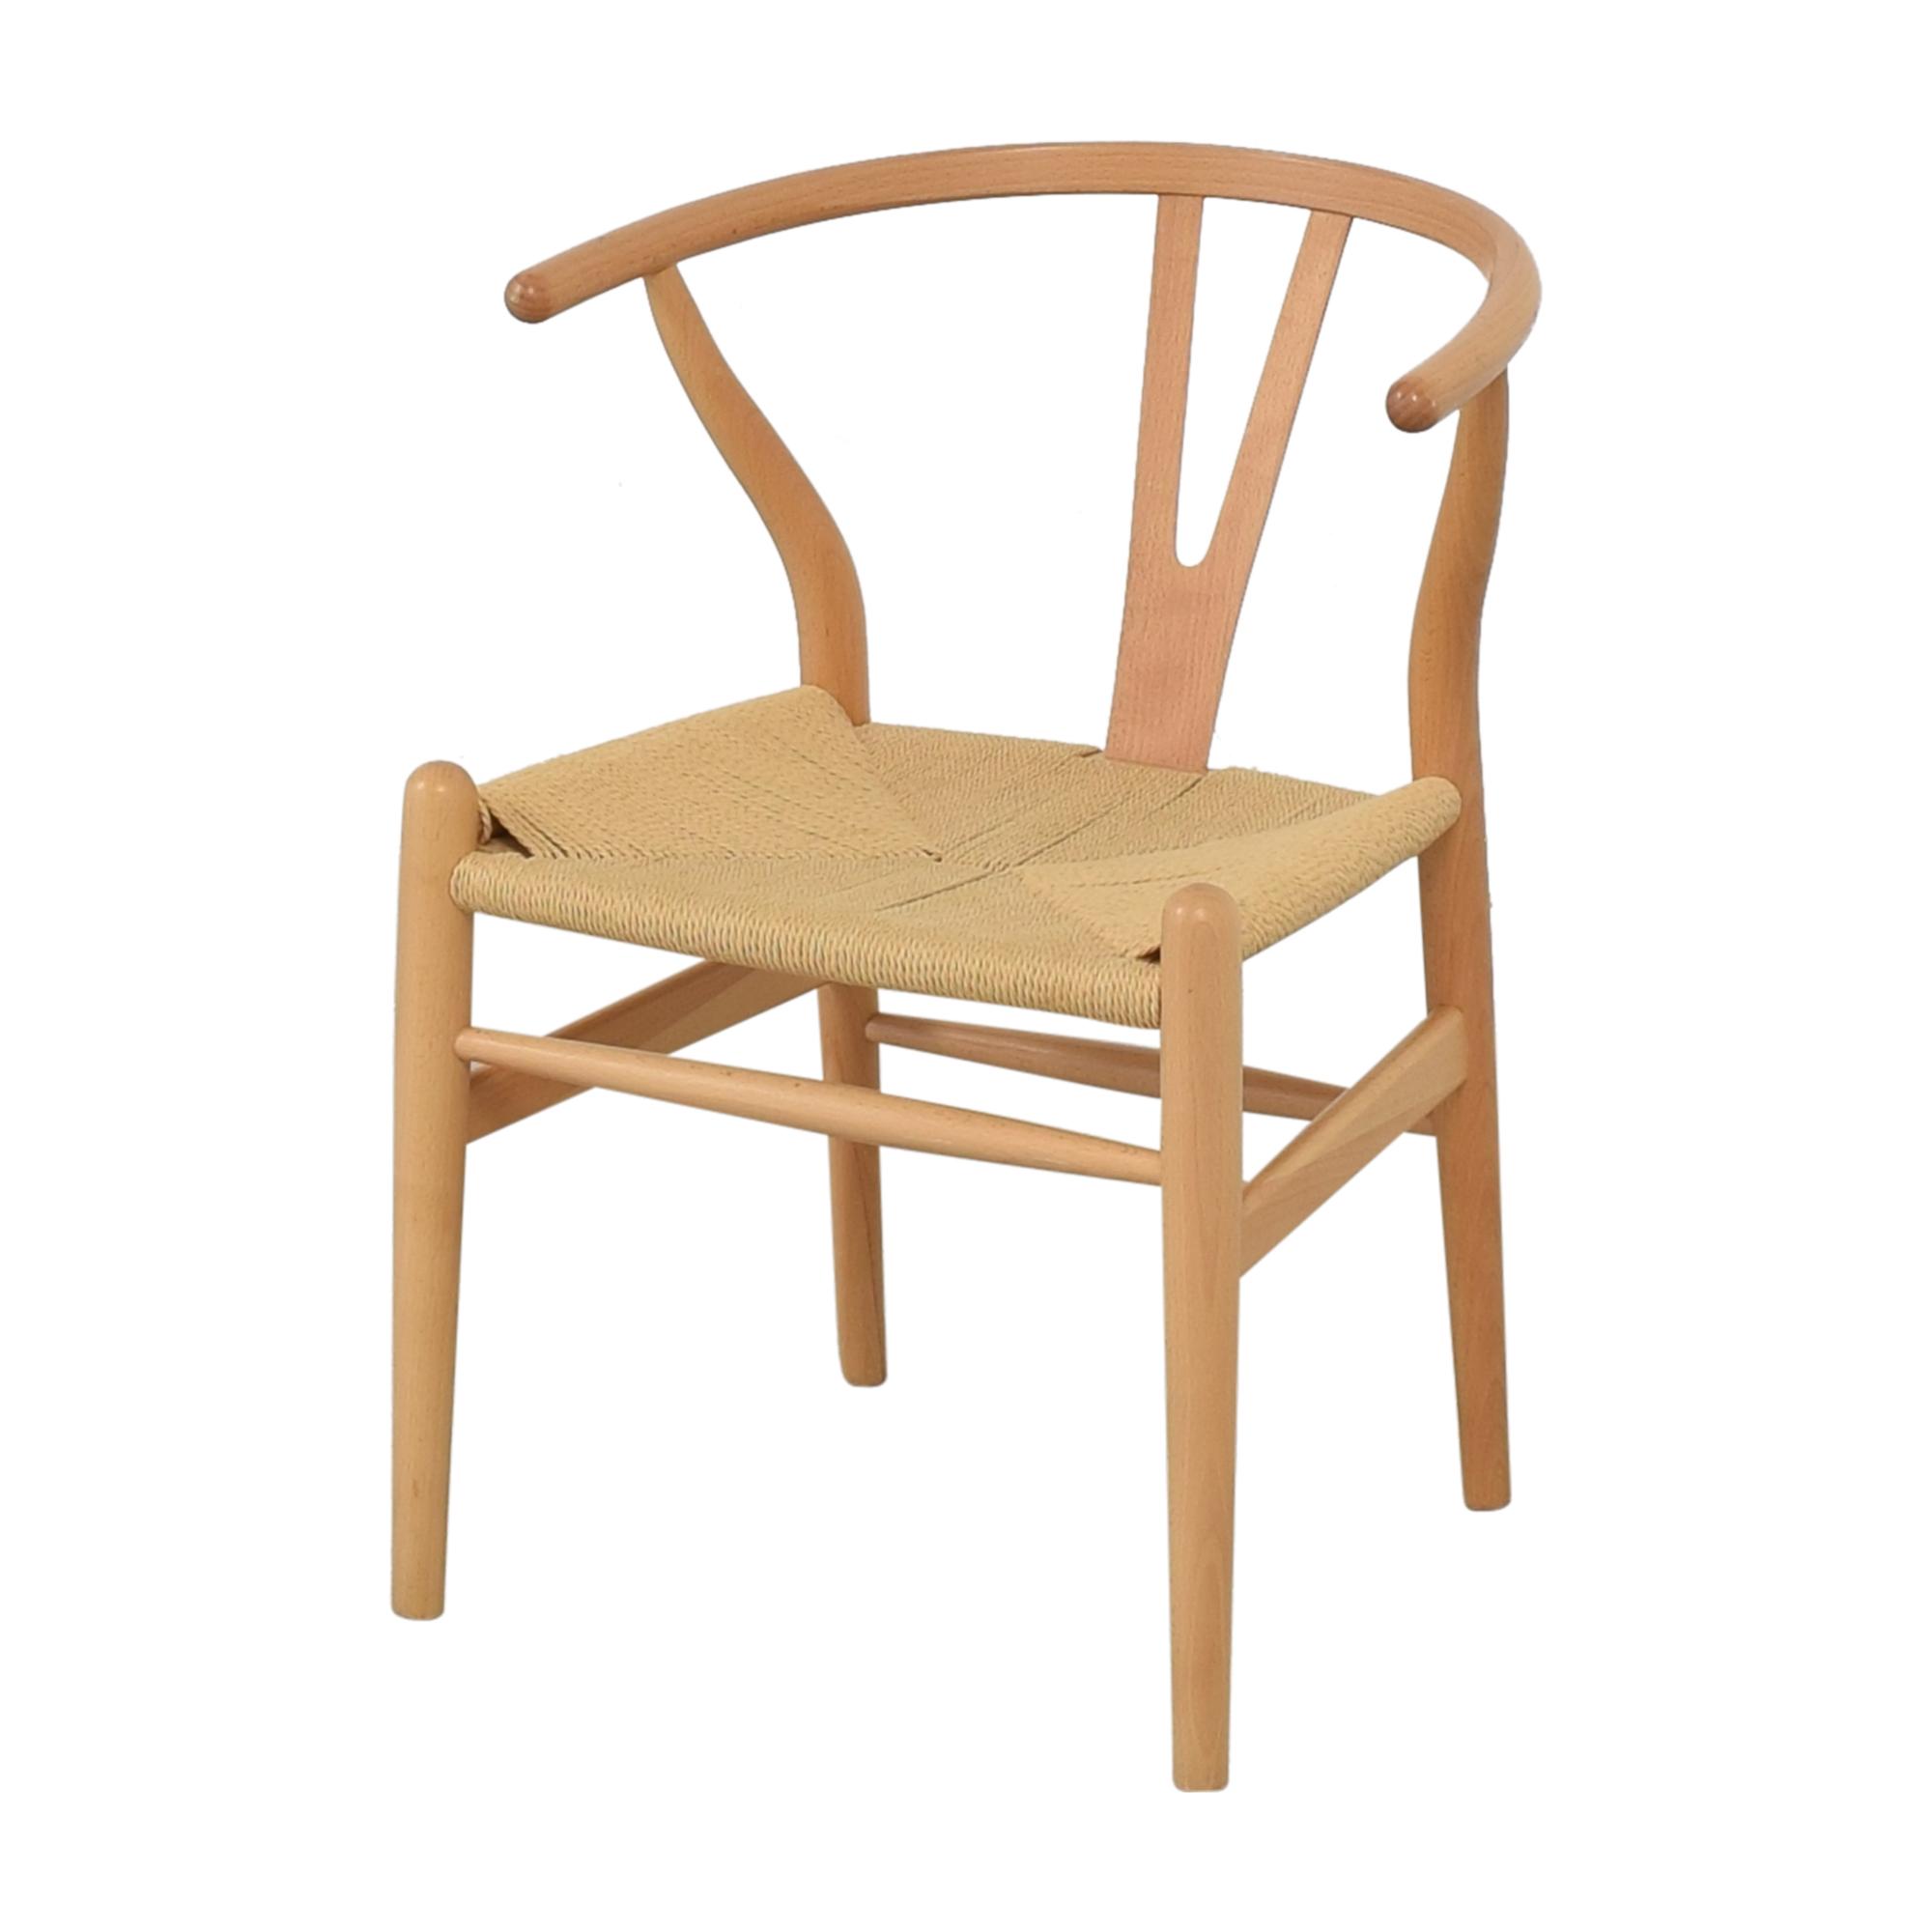 buy Baxton Studio Wishbone Modern Brown Wood Dining Chairs Baxton Studio Chairs